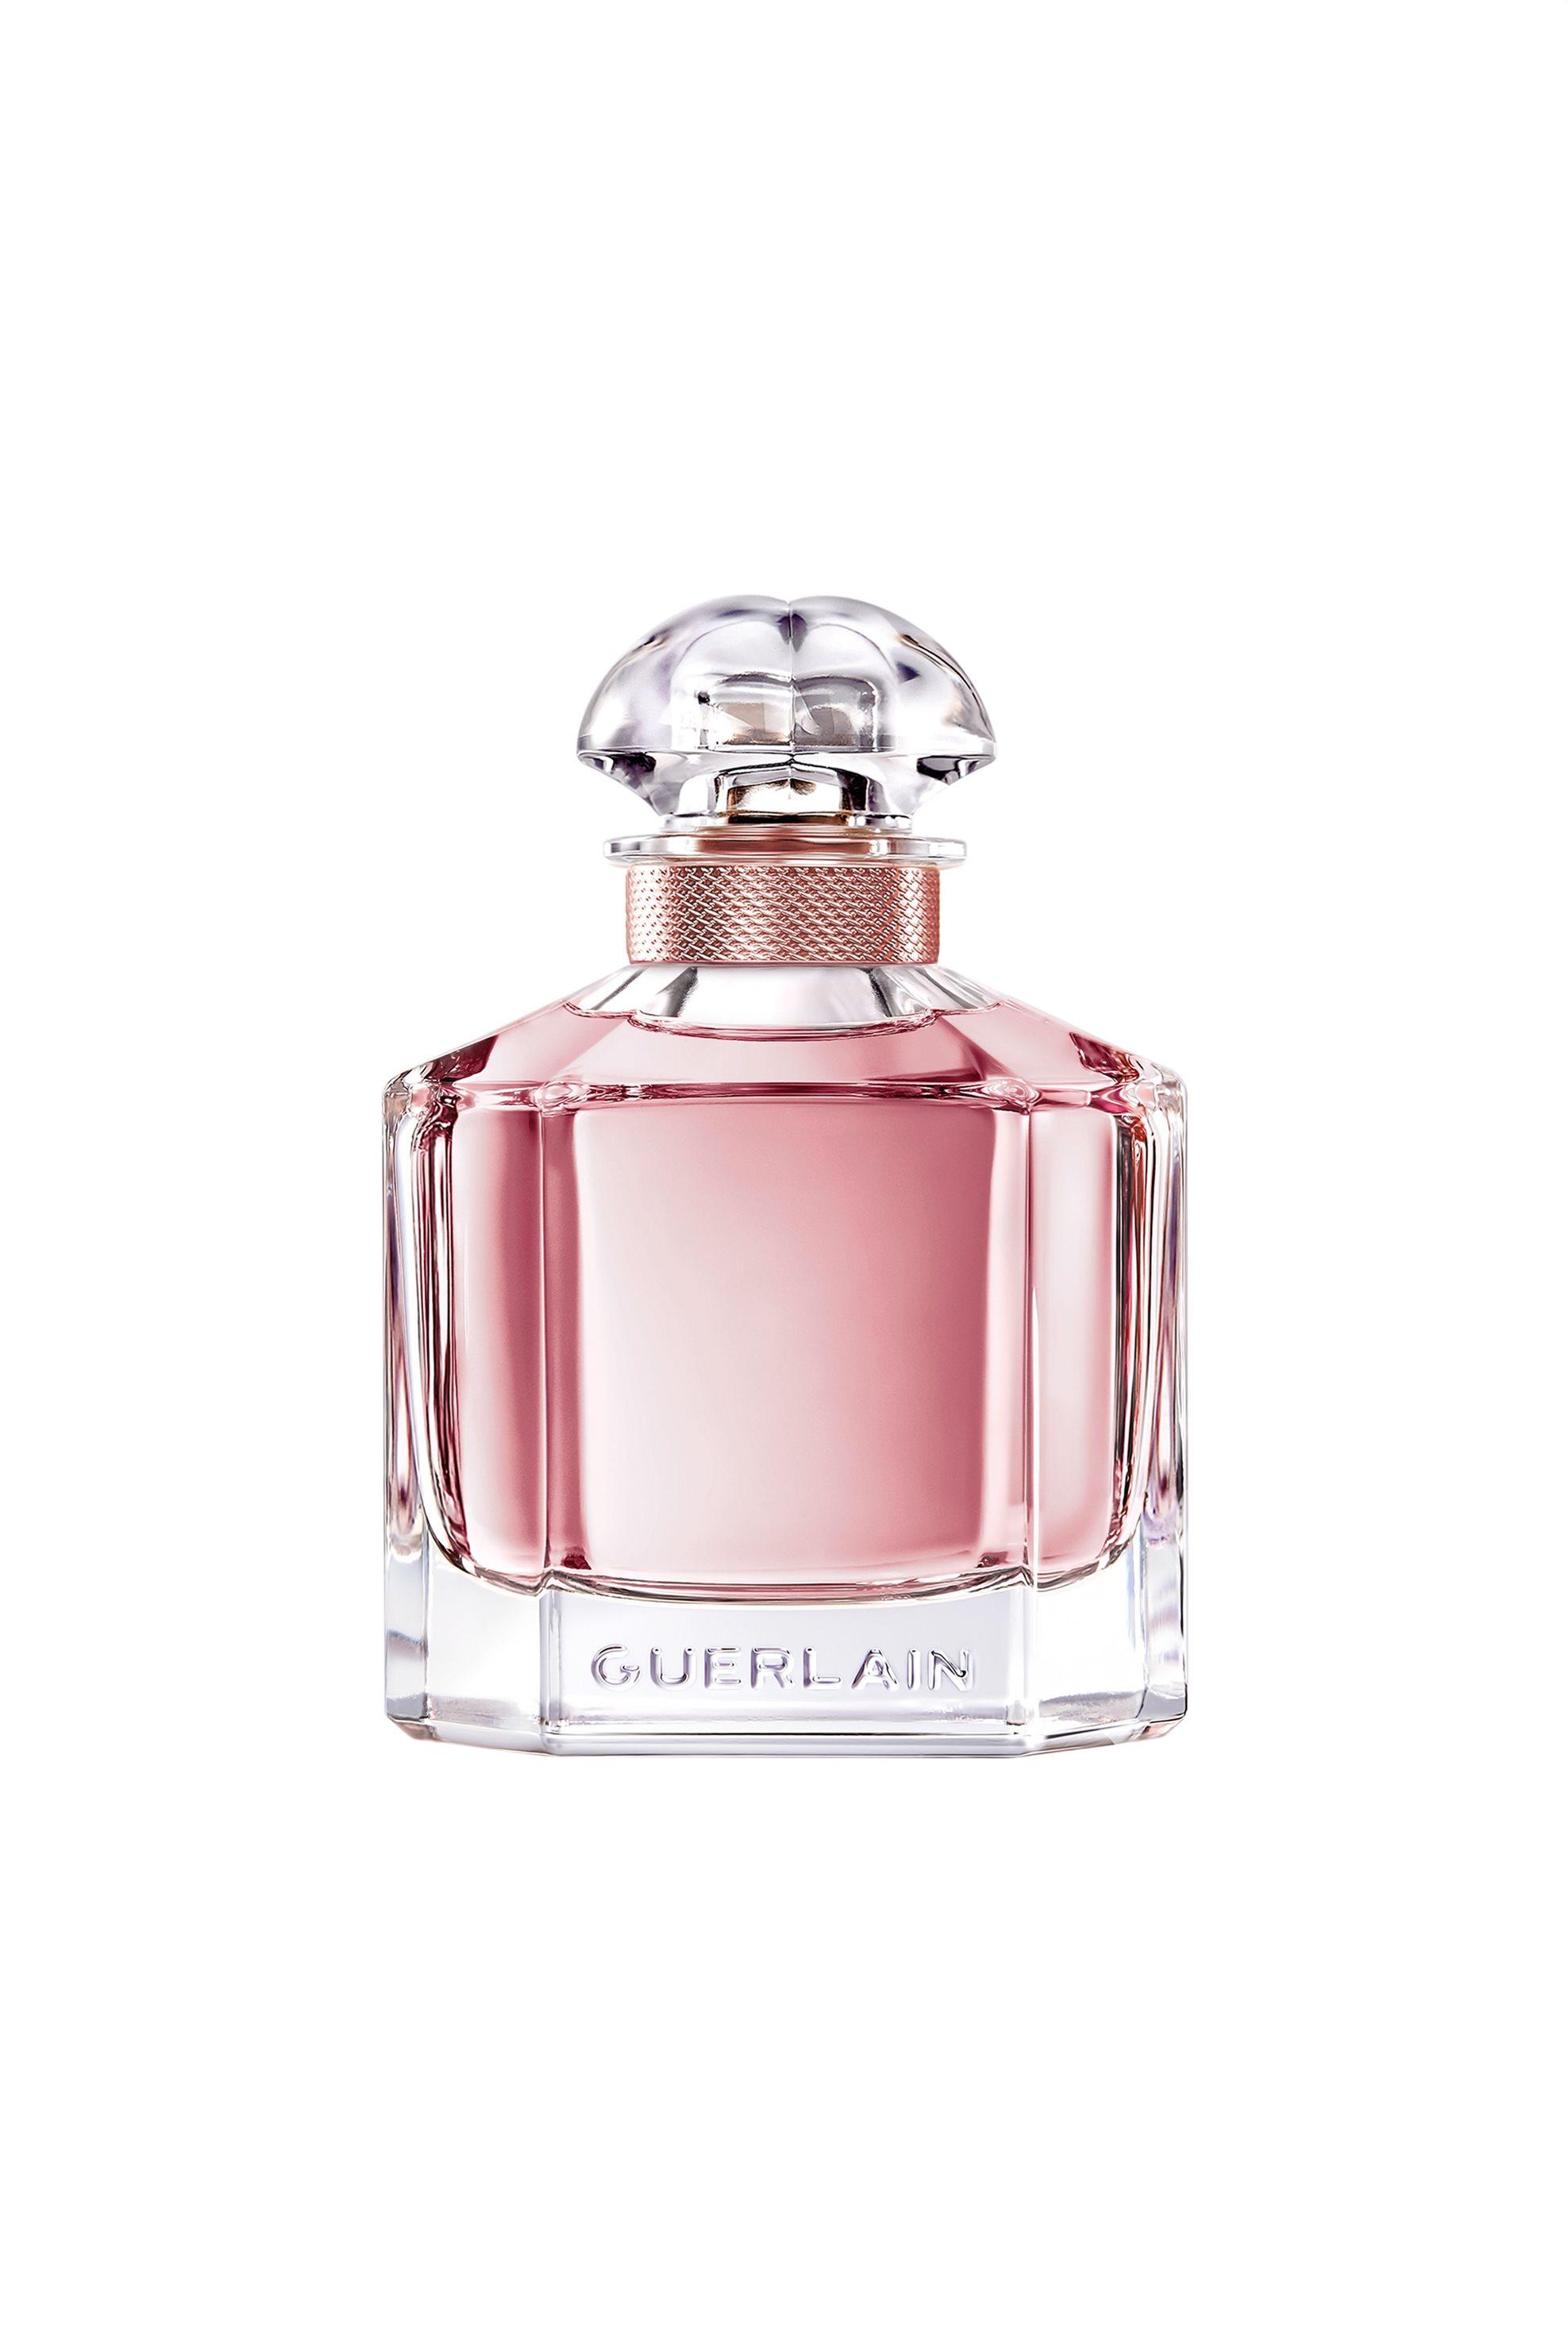 Guerlain Mon Guerlain Florale EdP 100 ml - G013399 ομορφια   καλλυντικα επιλεκτικησ   αρώματα   γυναικεία αρώματα   eau de parfum